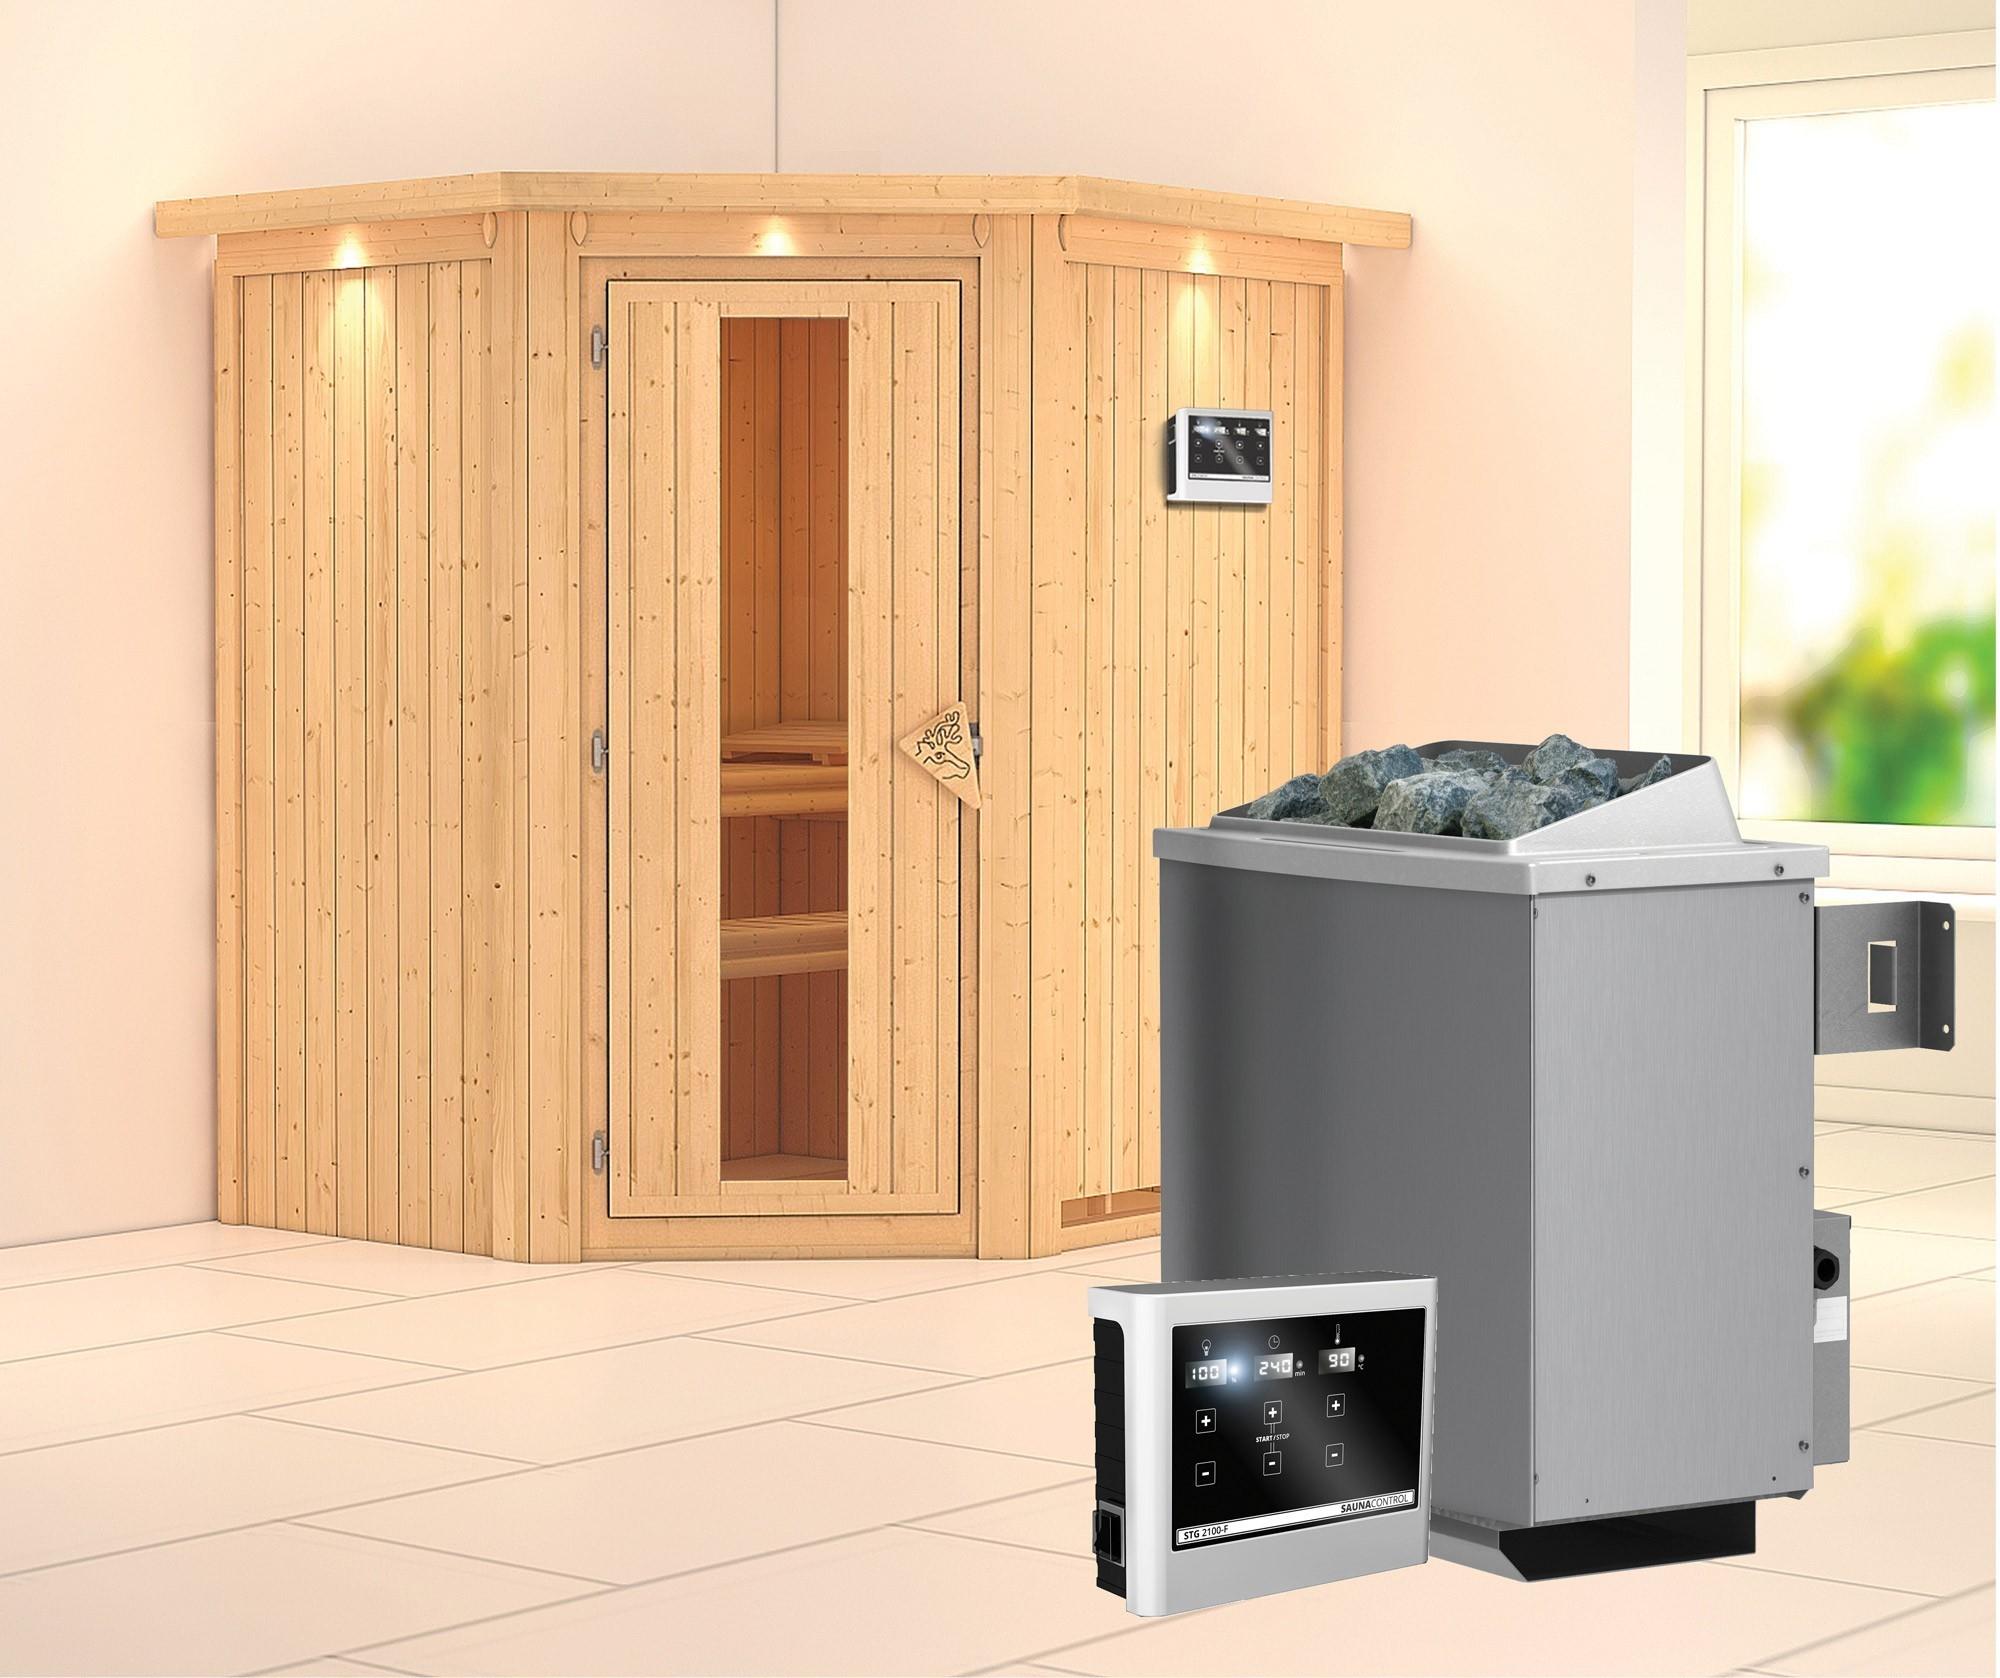 Karibu Sauna Taurin 68mm Dachkranz Saunaofen 9kW extern Holztür Bild 1